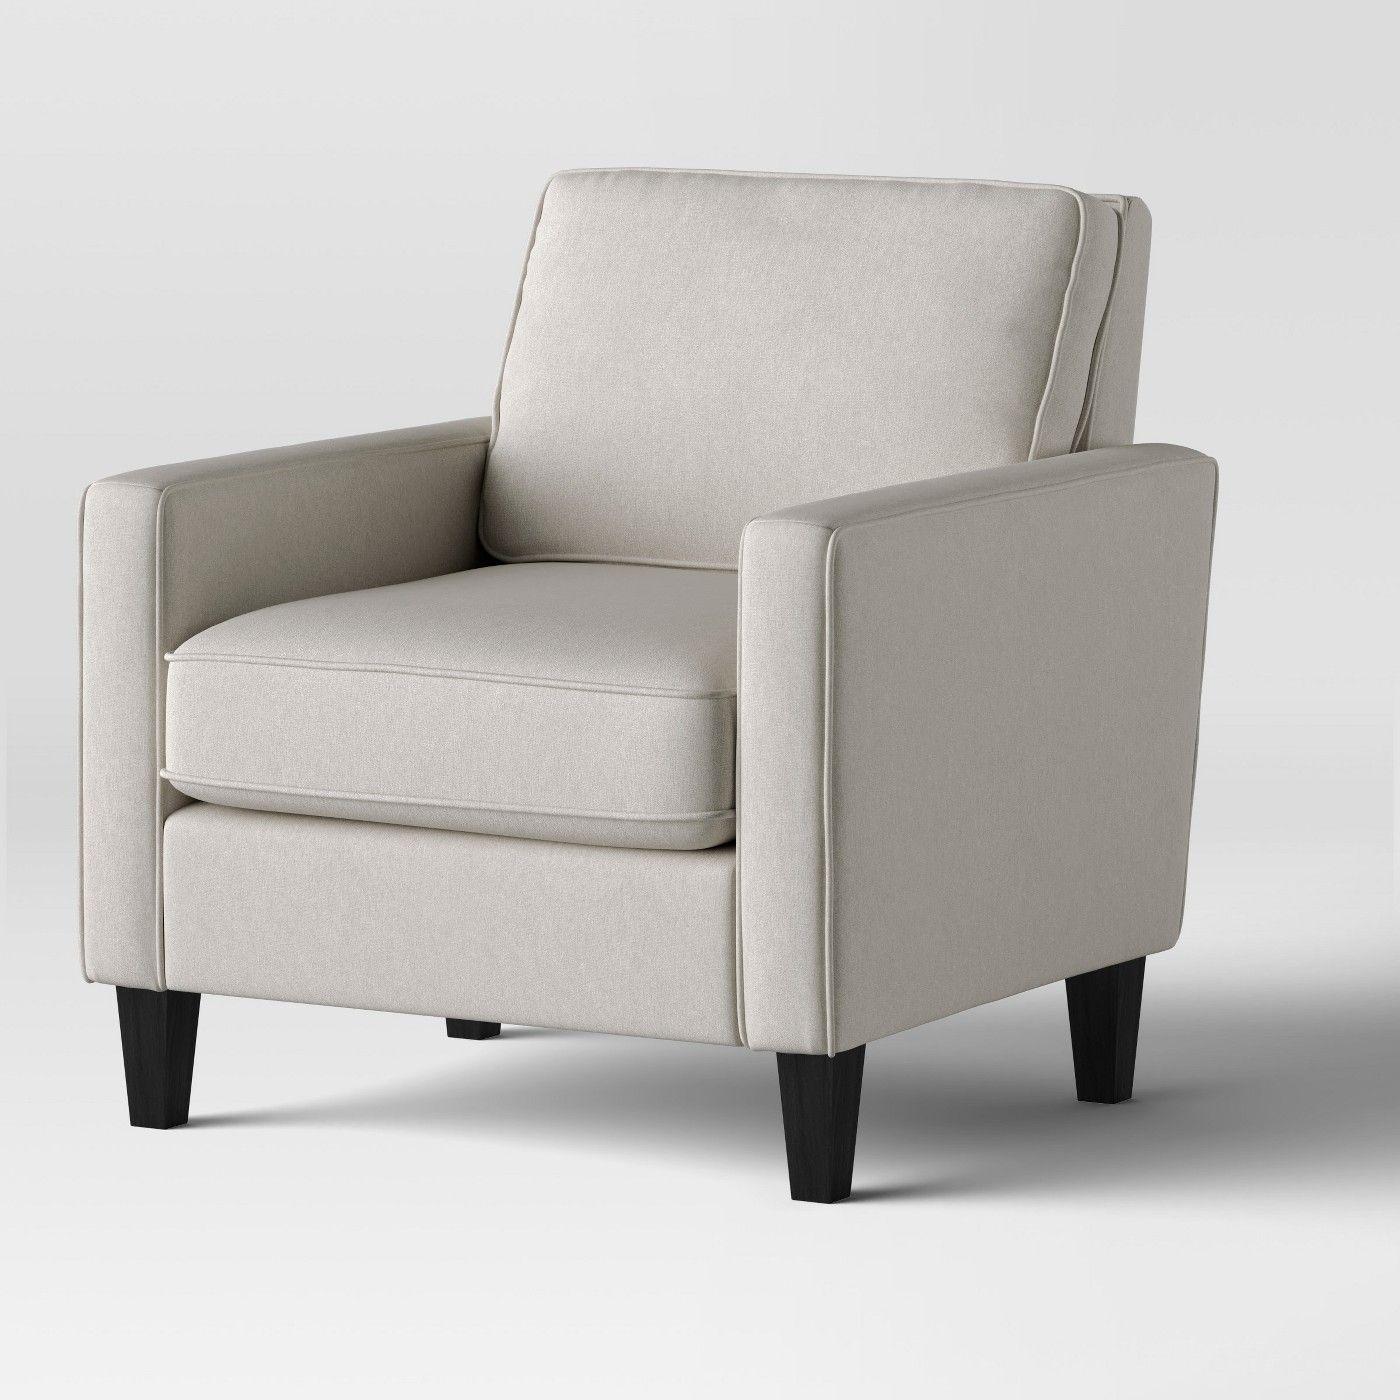 Sleeper Chair Modern House